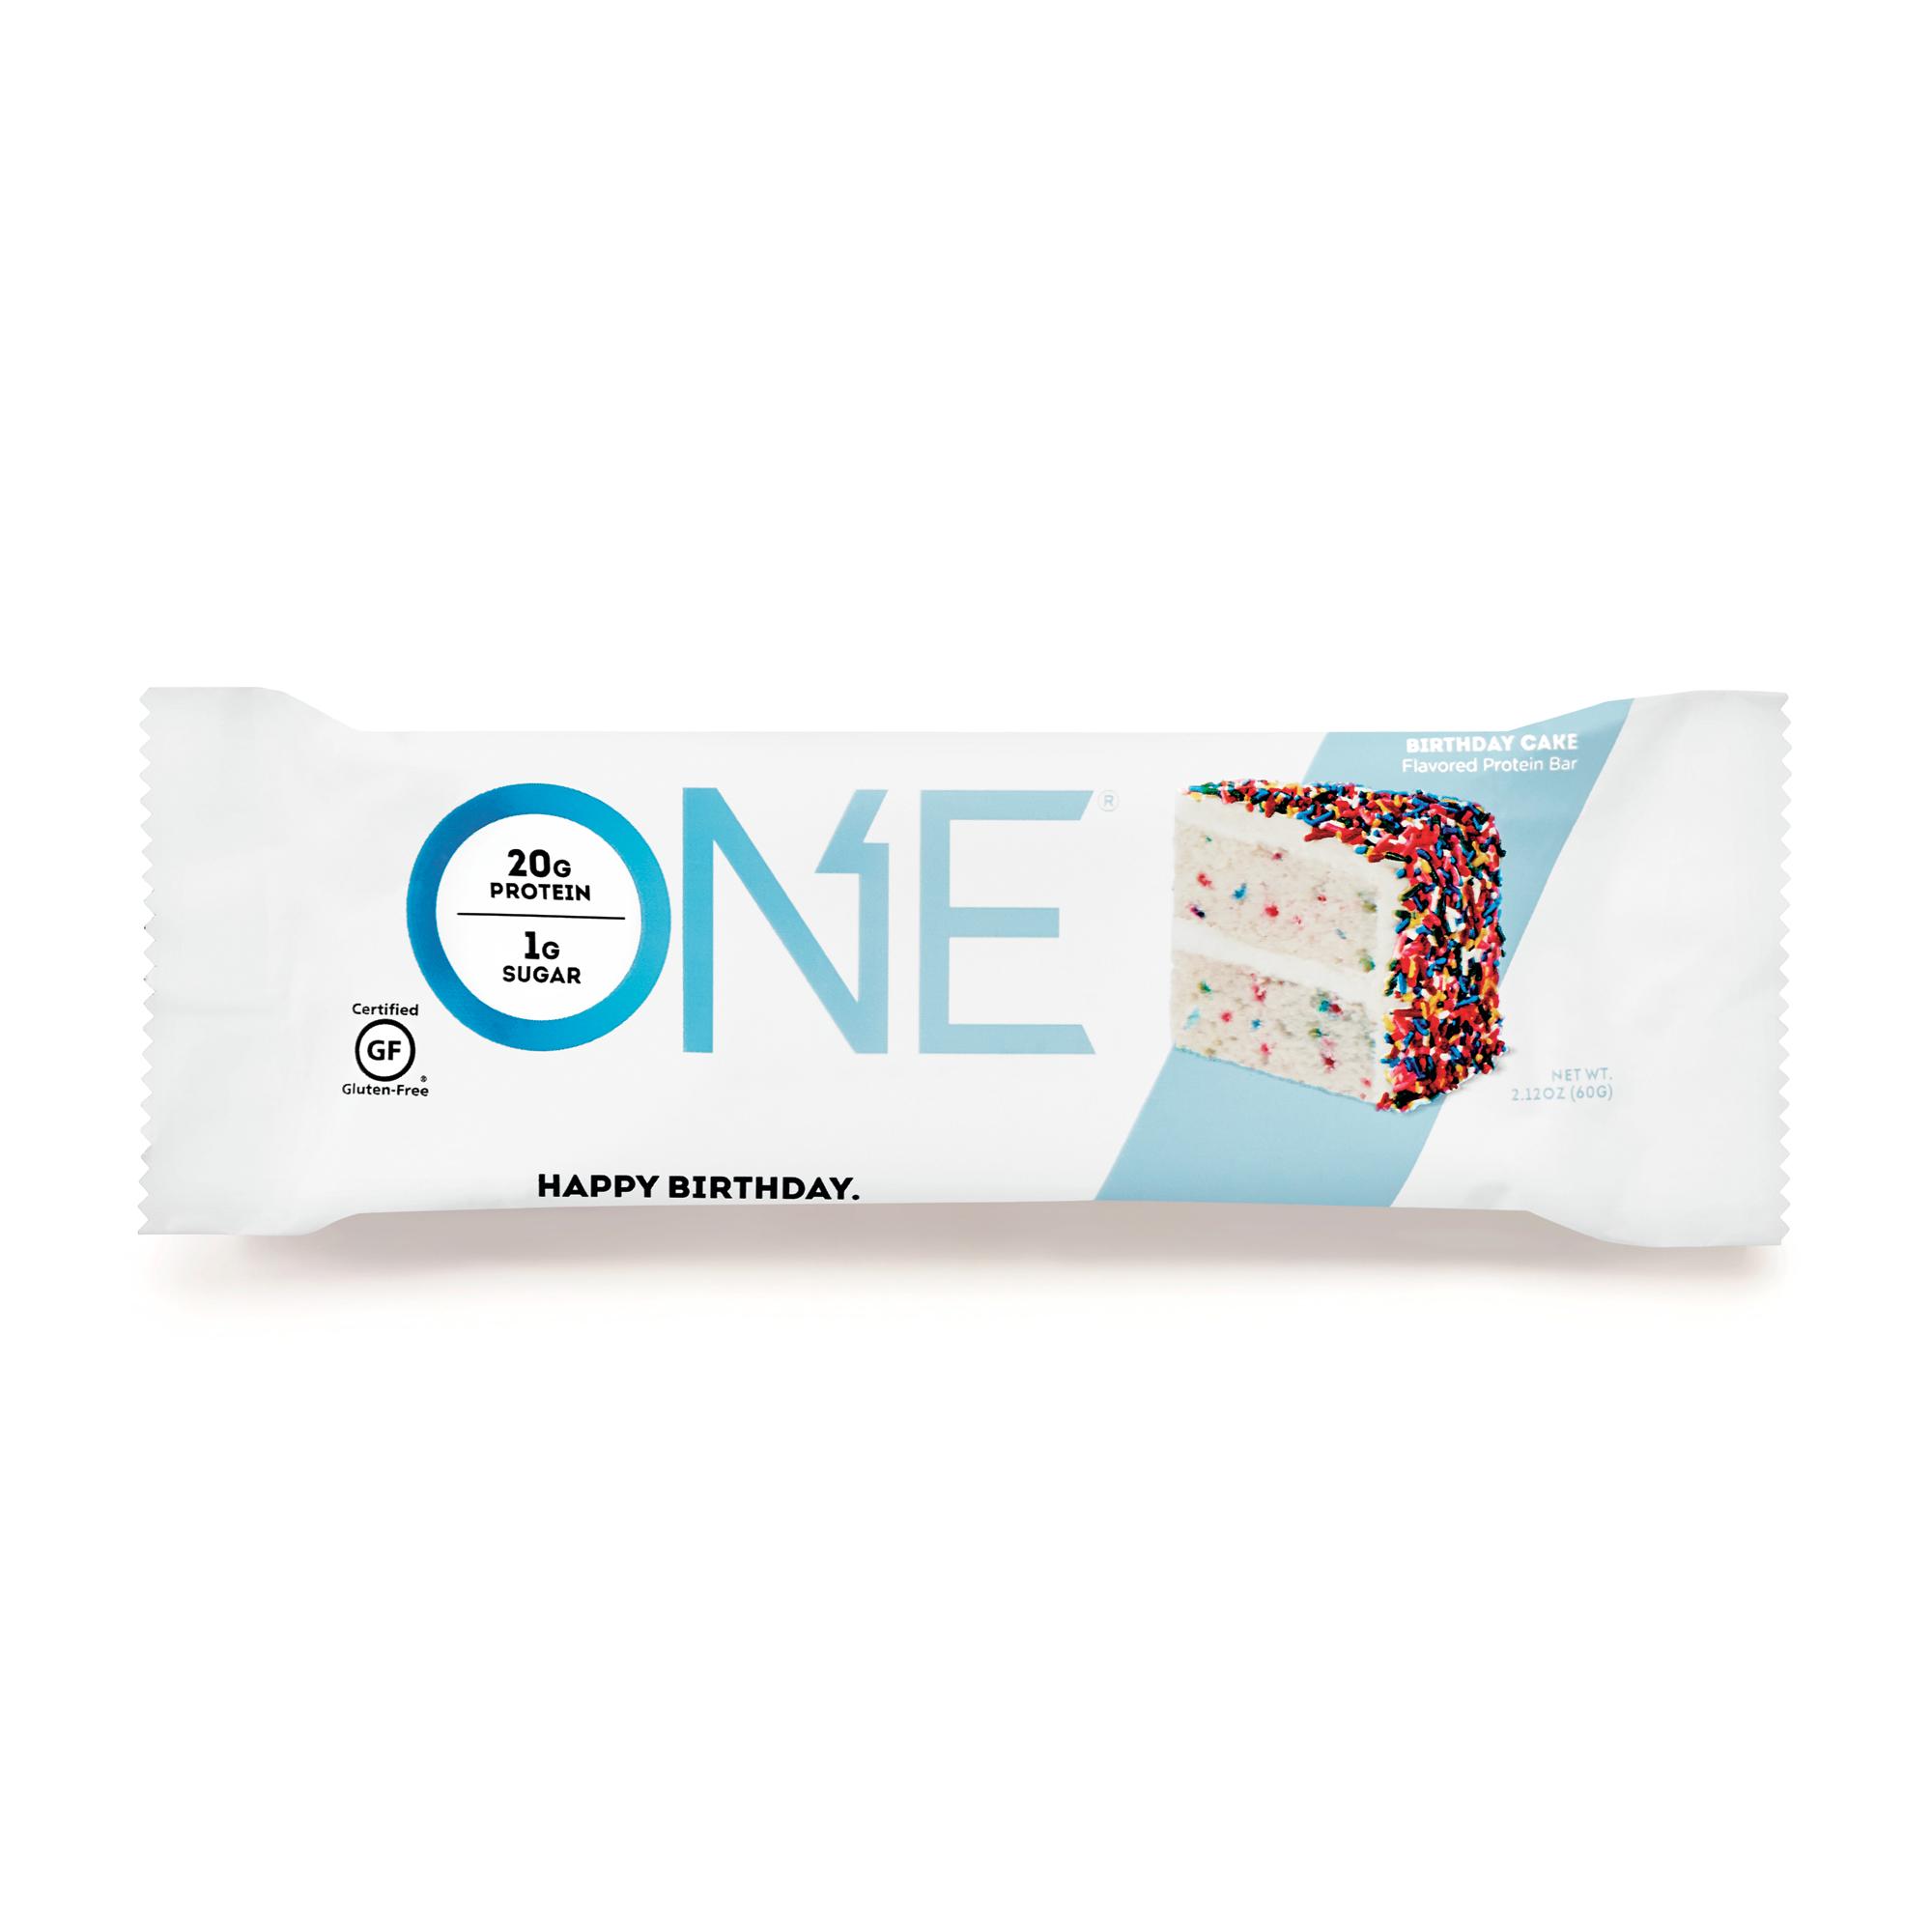 ONER Protein Bar